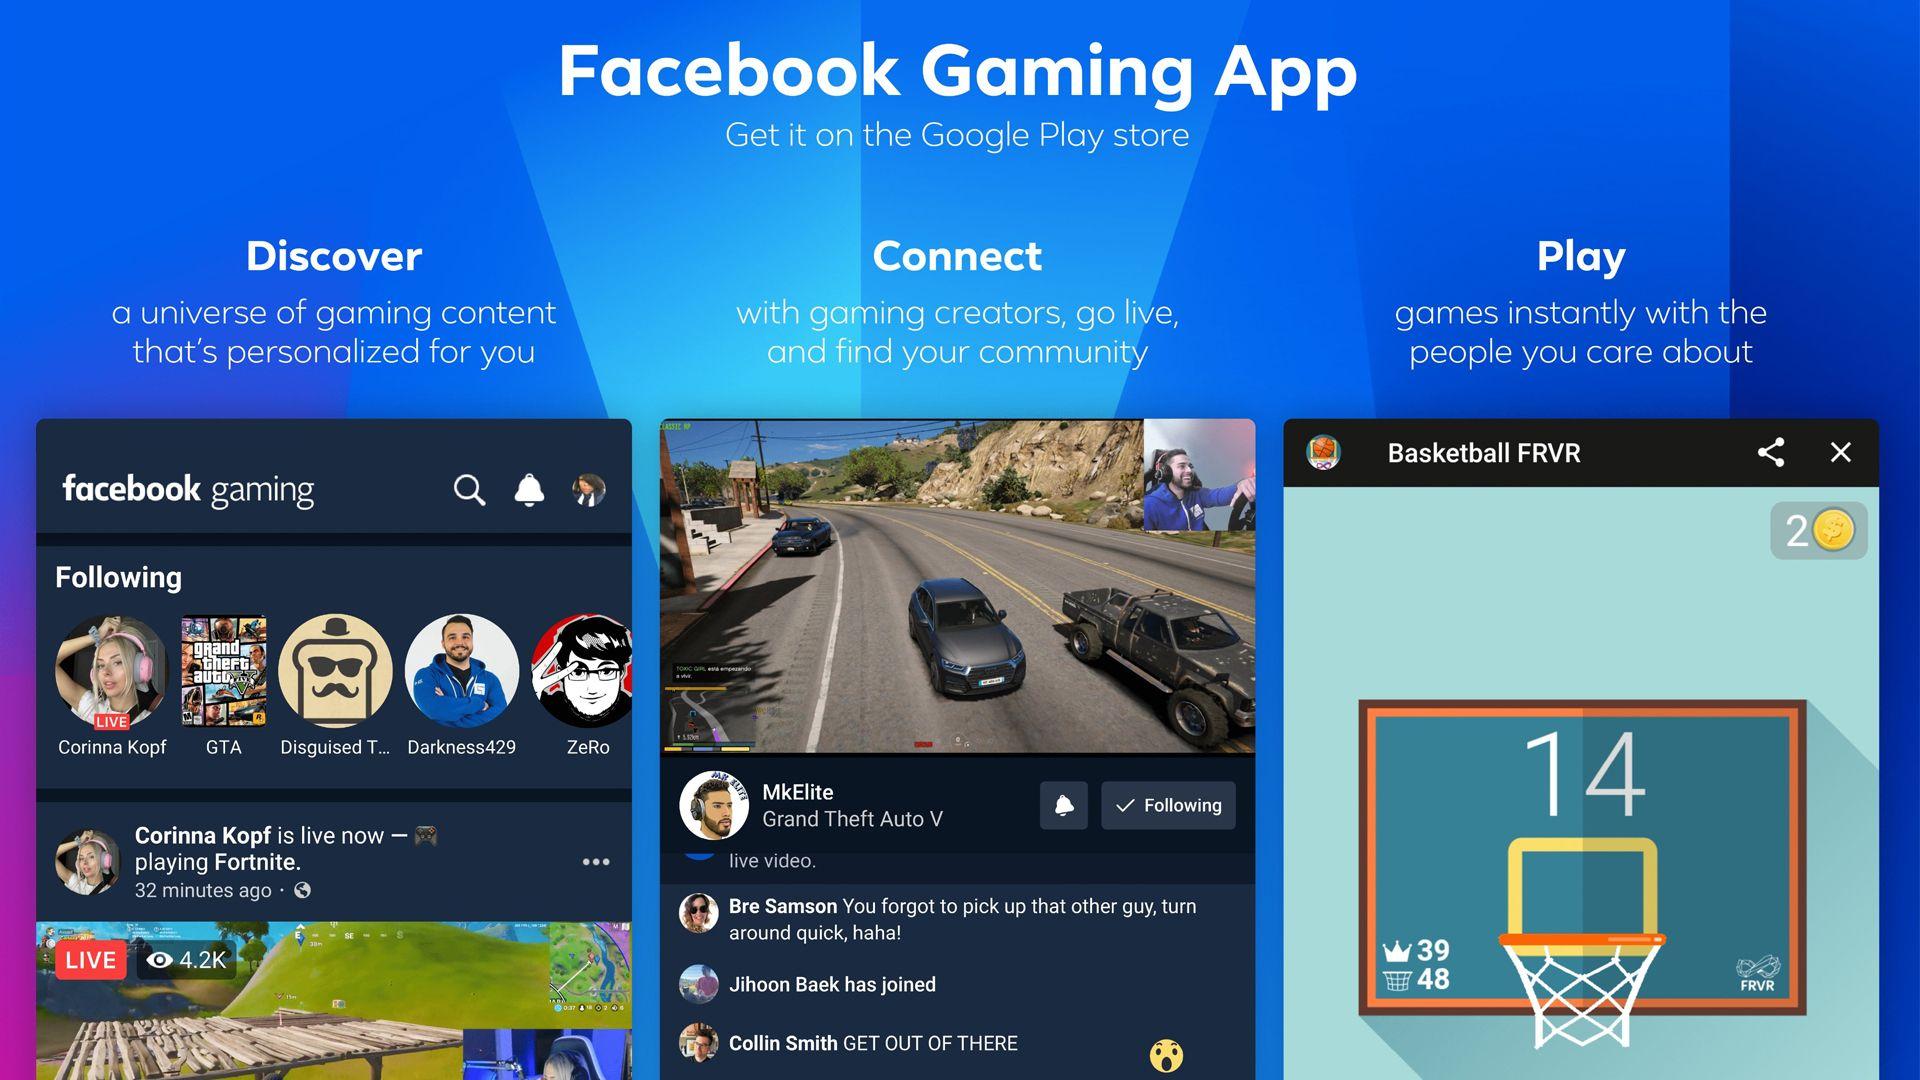 O app é disponibilizado para Android e IOS. (Fonte: Twitter/Facebook Gaming)